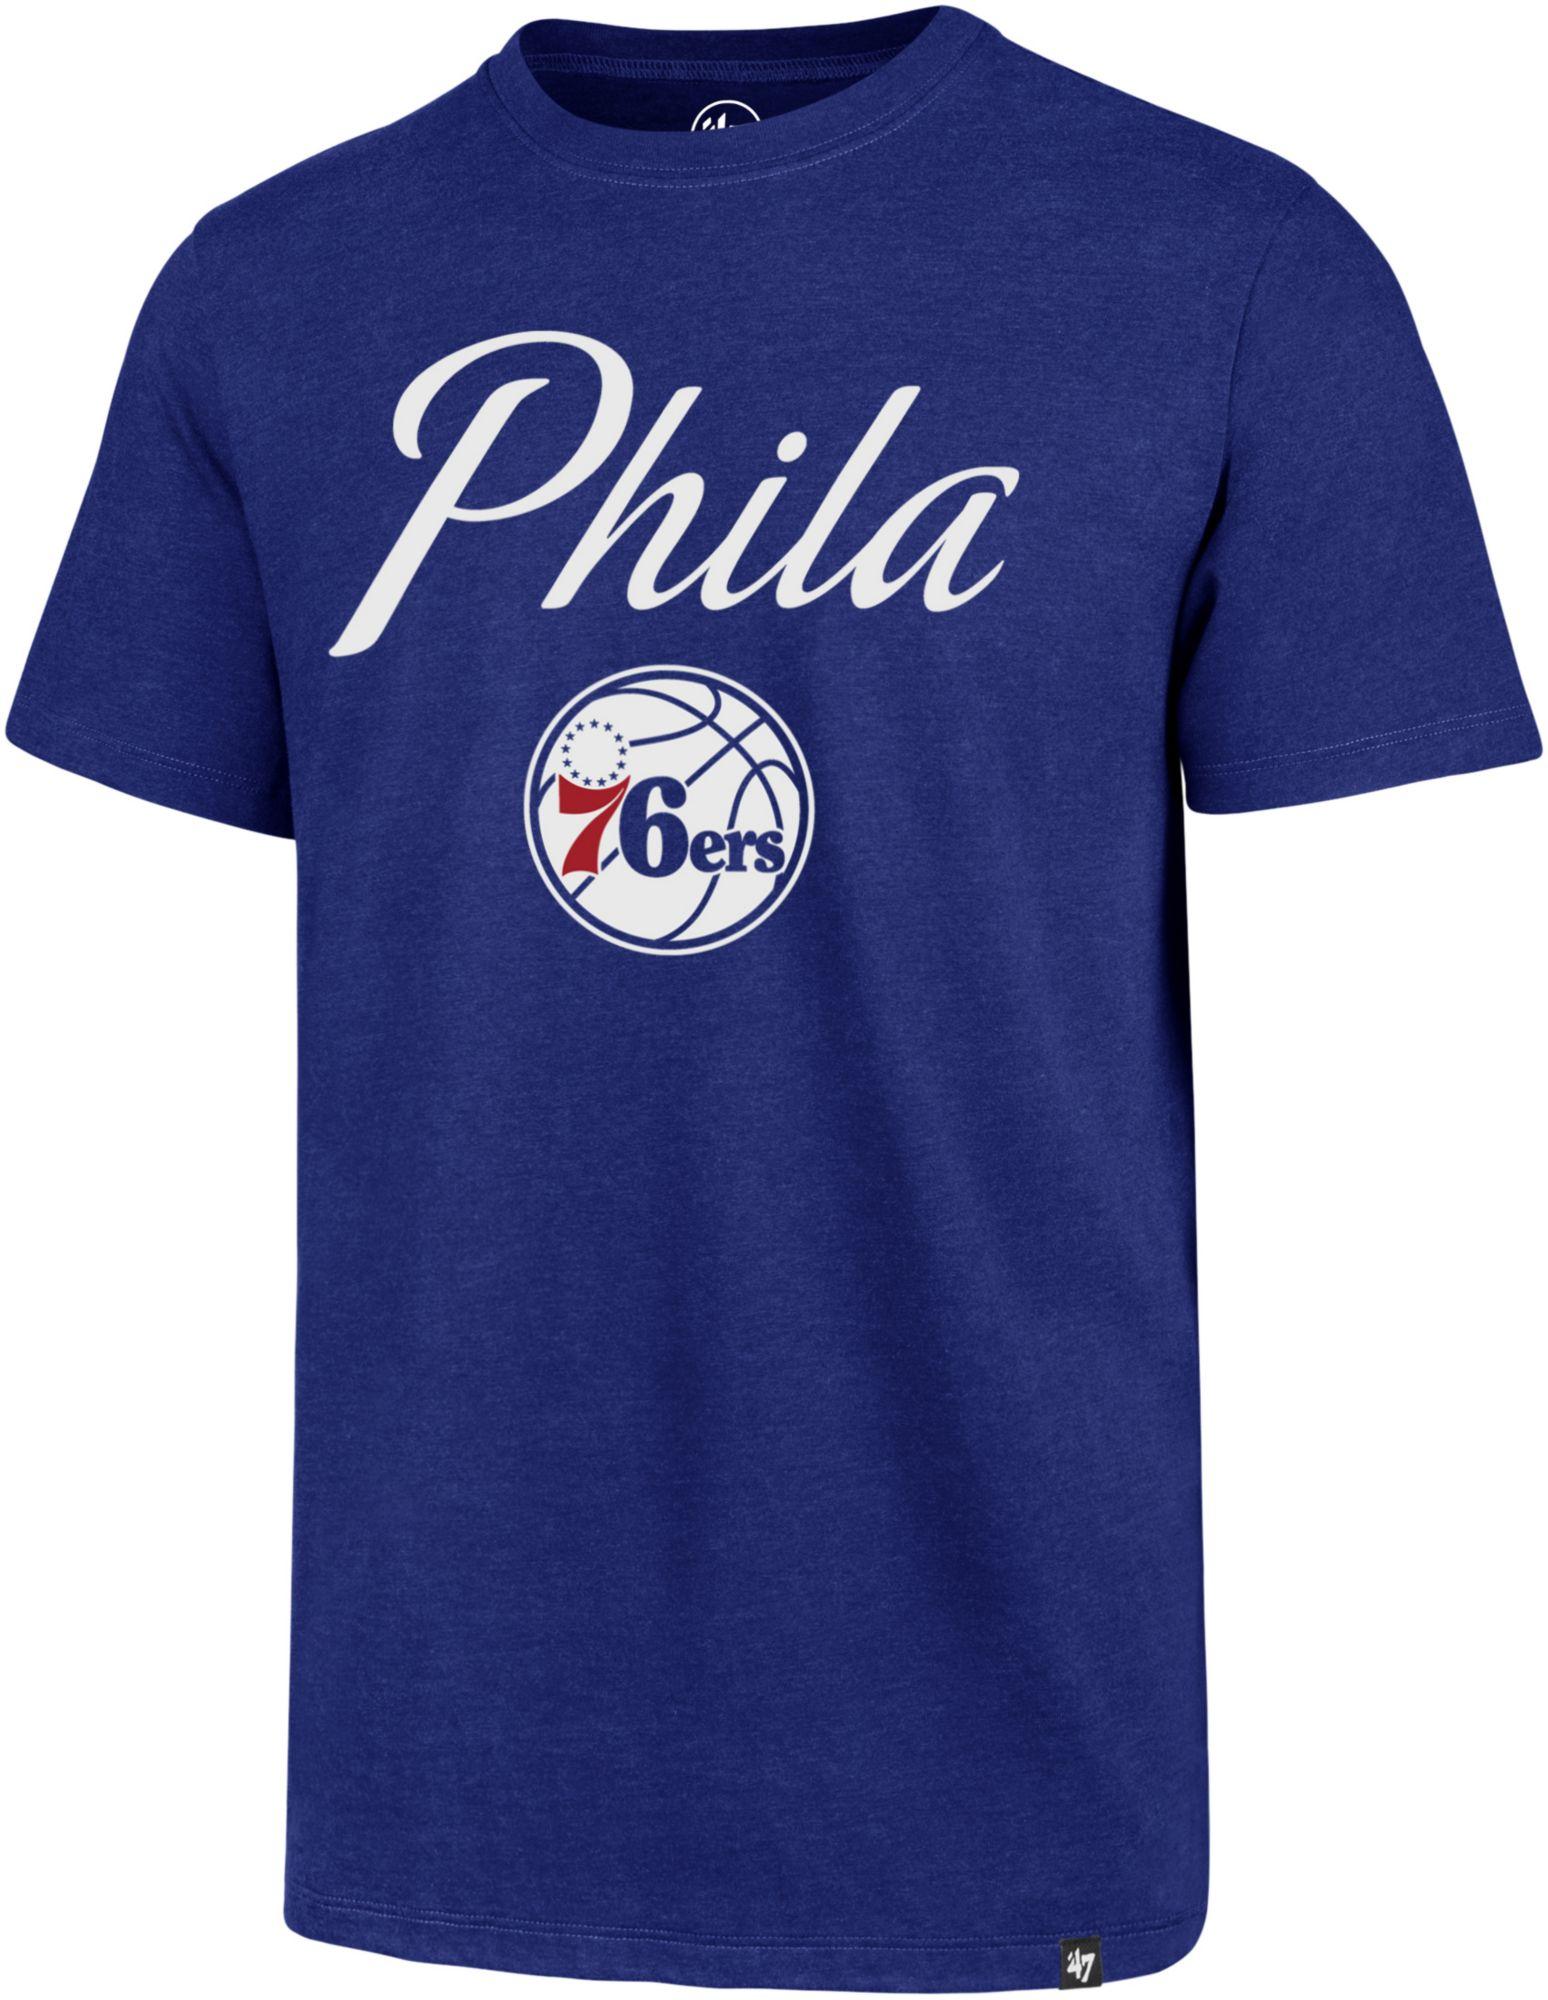 47 S Philadelphia 76ers Phila Shirts